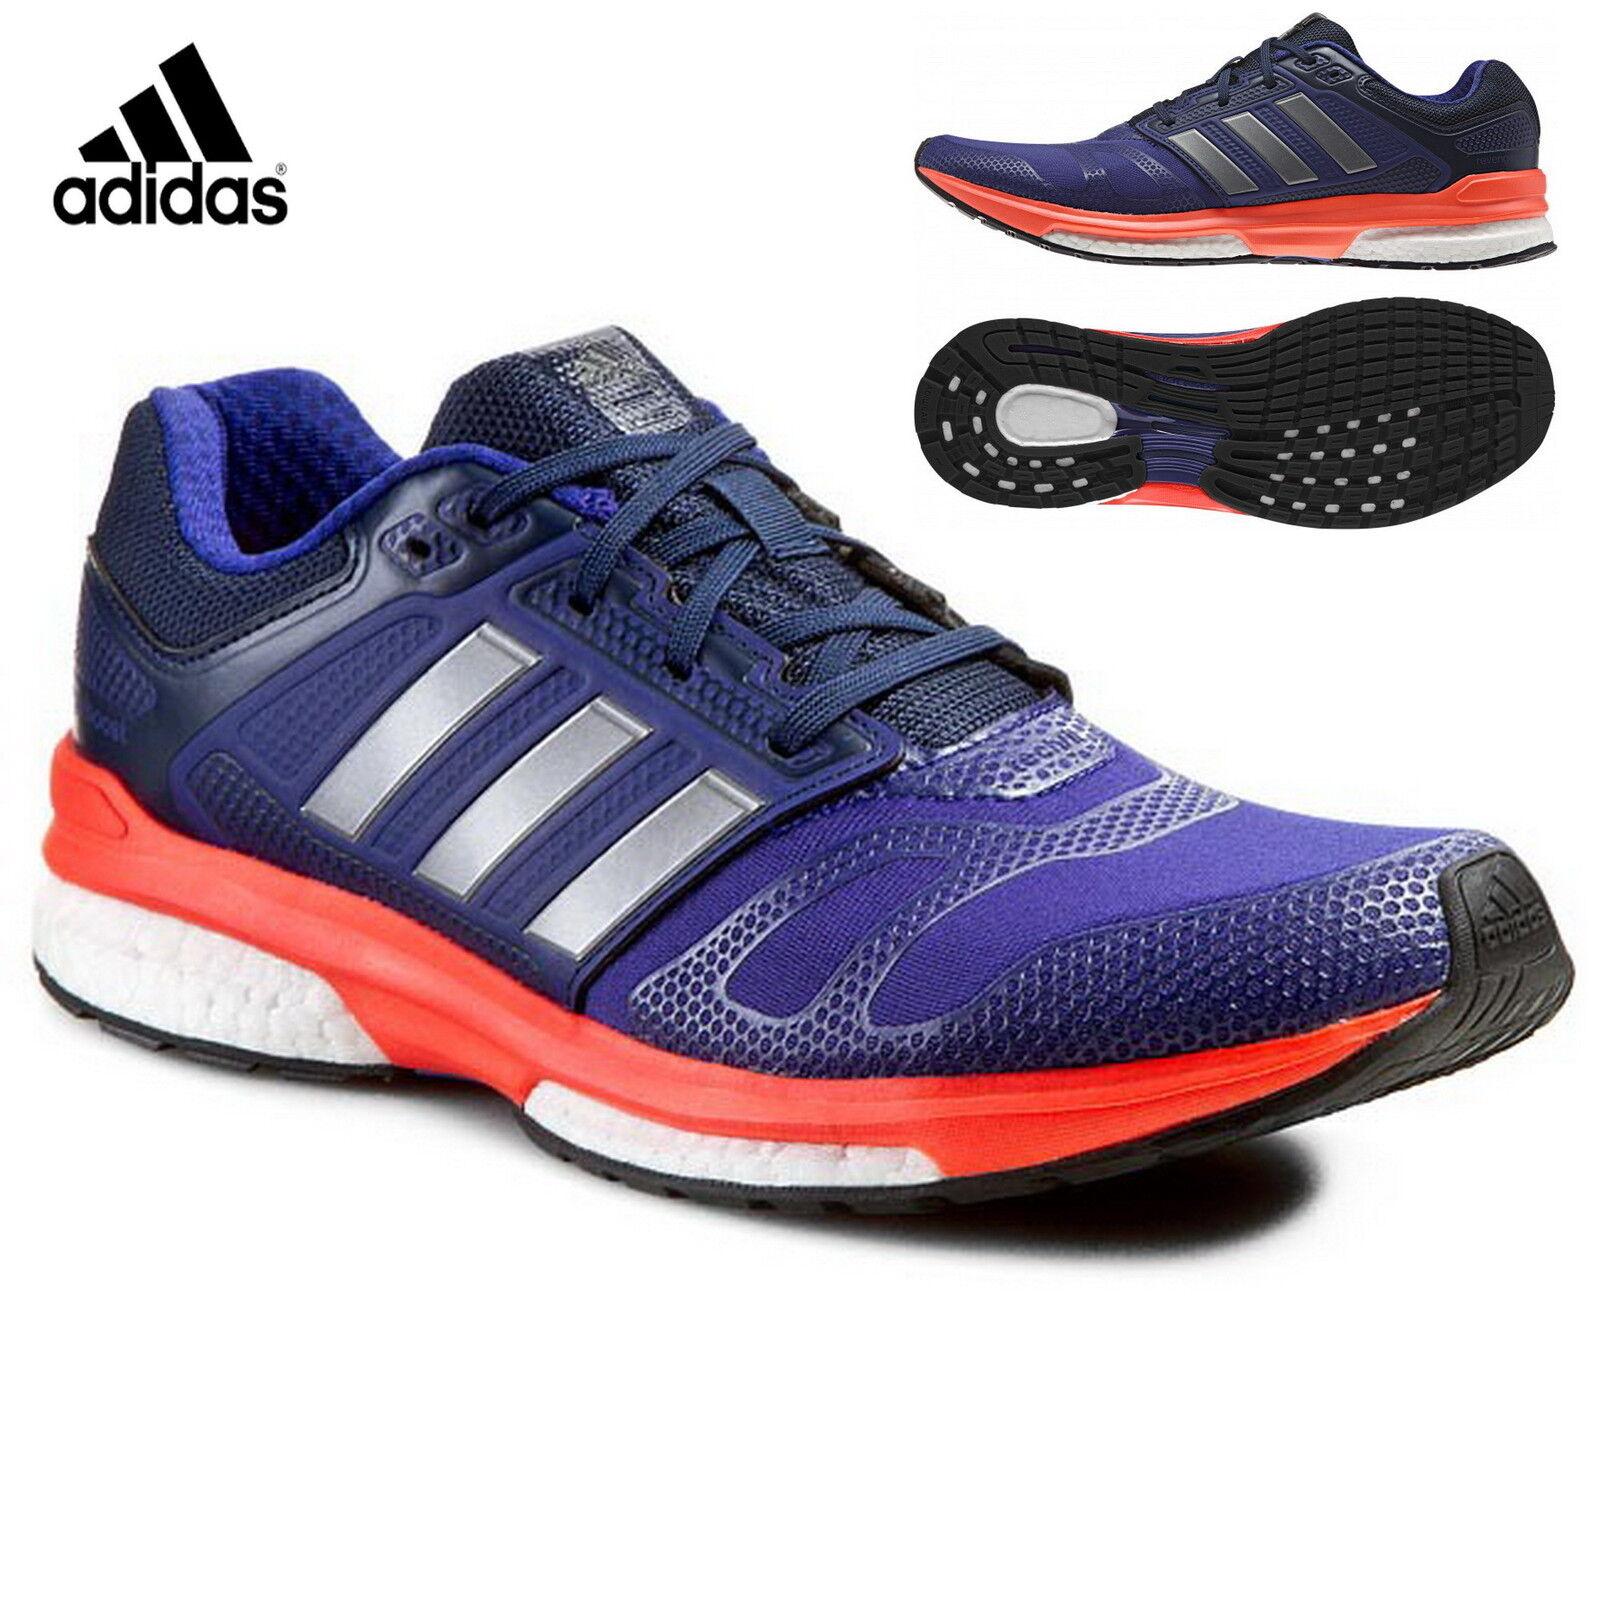 Adidas Response Revenge Boost 2 Techfit Techfit Techfit Herren Laufschuhe M29492 lila solar 9f3247